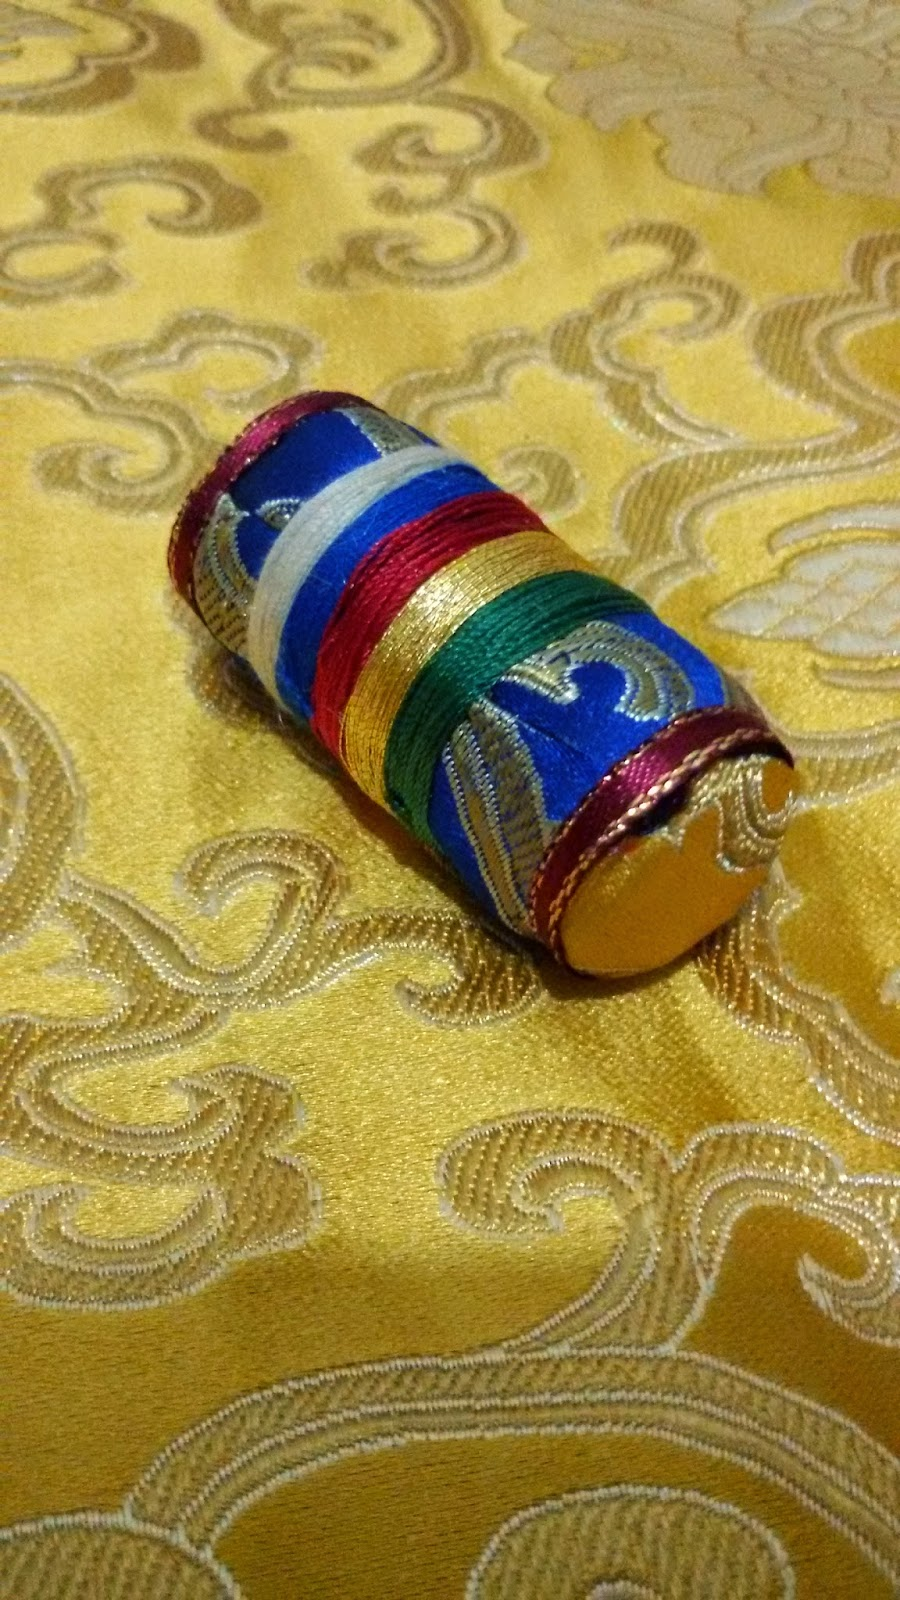 Tibetan Healing Amulet Chakra Protections Amulet Ruels